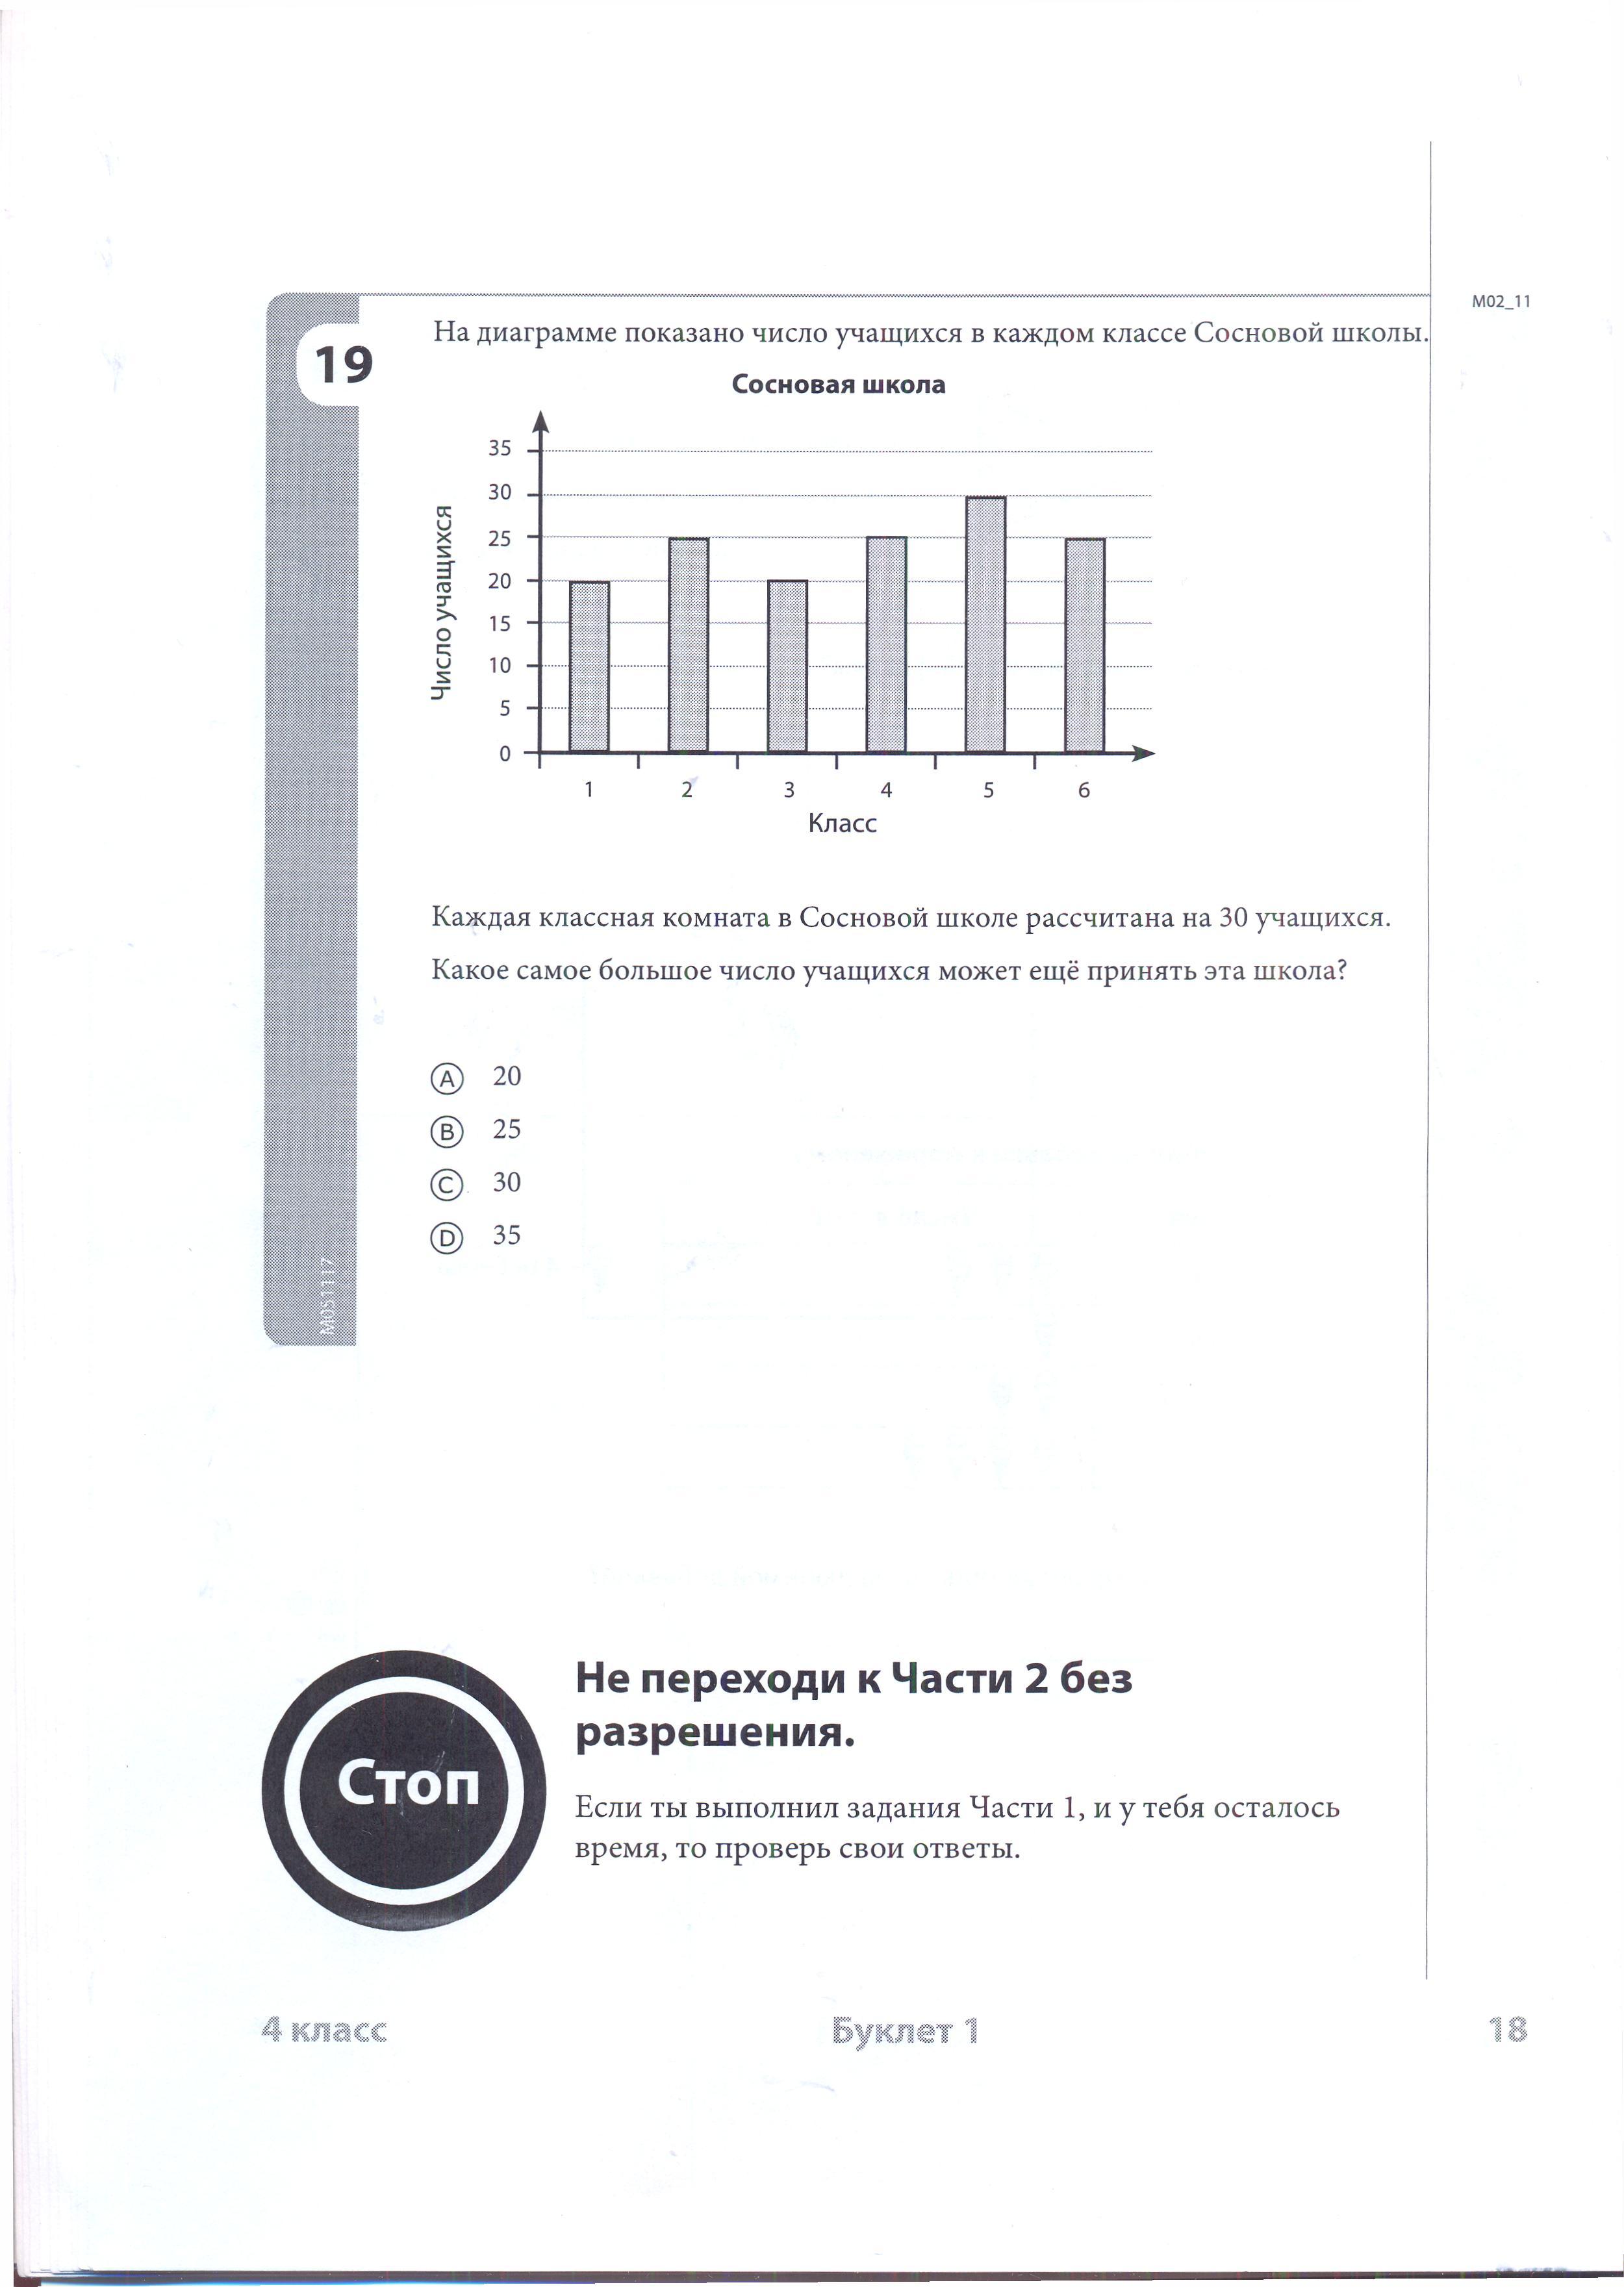 H:\Доклад ТИМСС Алматы 8.04.2014\TIMSS MATEM 4 kl_1 var\Matematic_4 kl_1 var0015.jpg